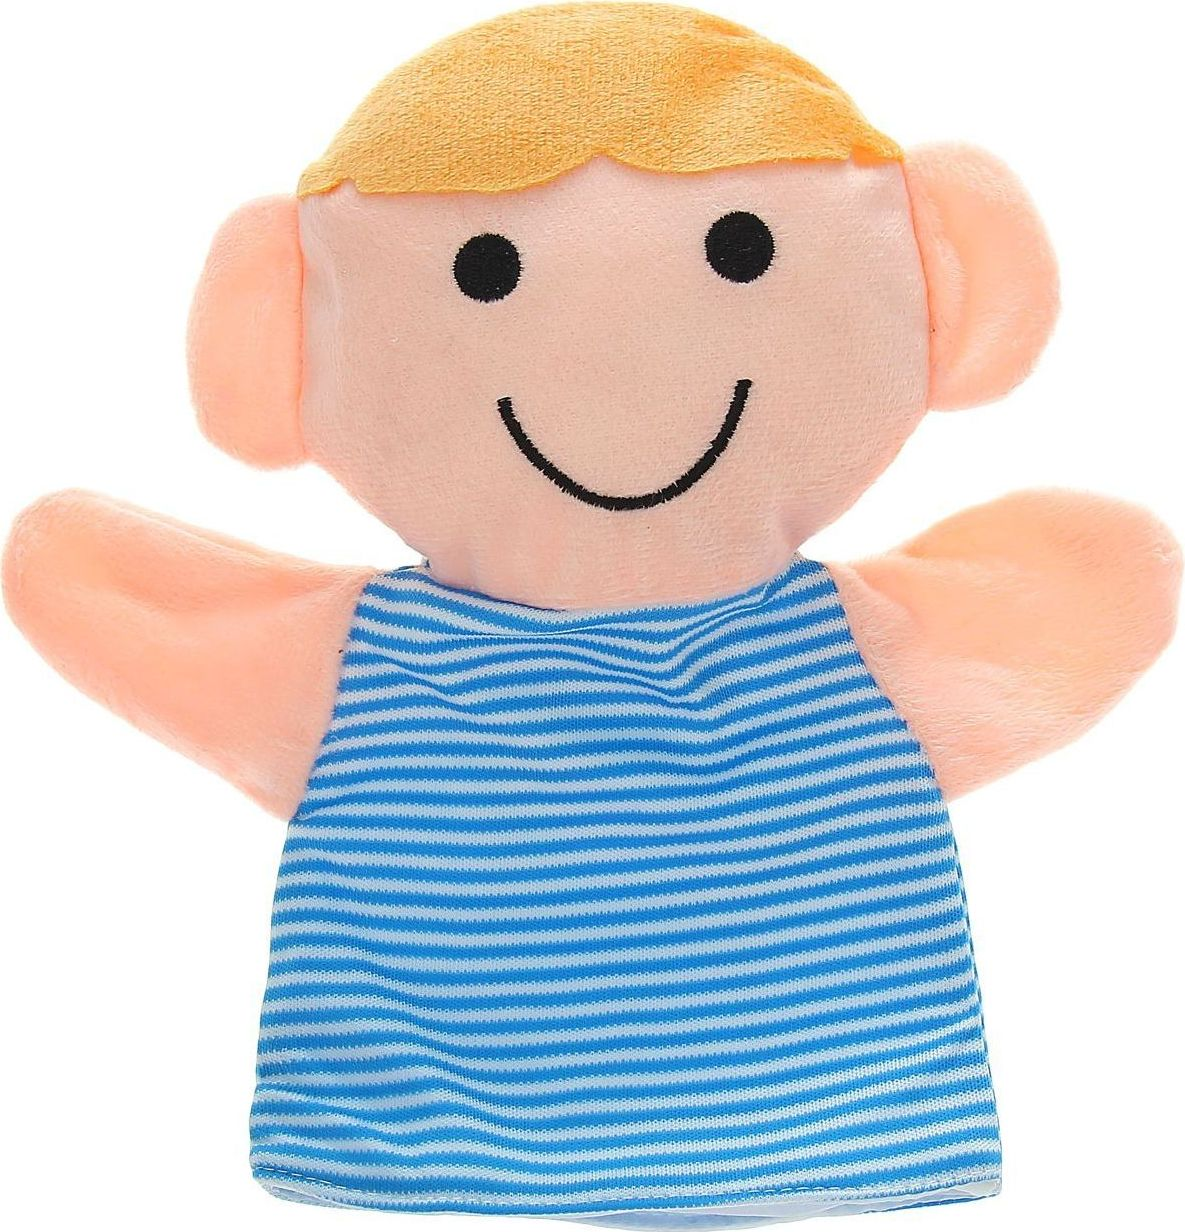 Sima-land Мягкая игрушка на руку Мальчик 1147835 sima land мягкая игрушка на руку заяц 506986